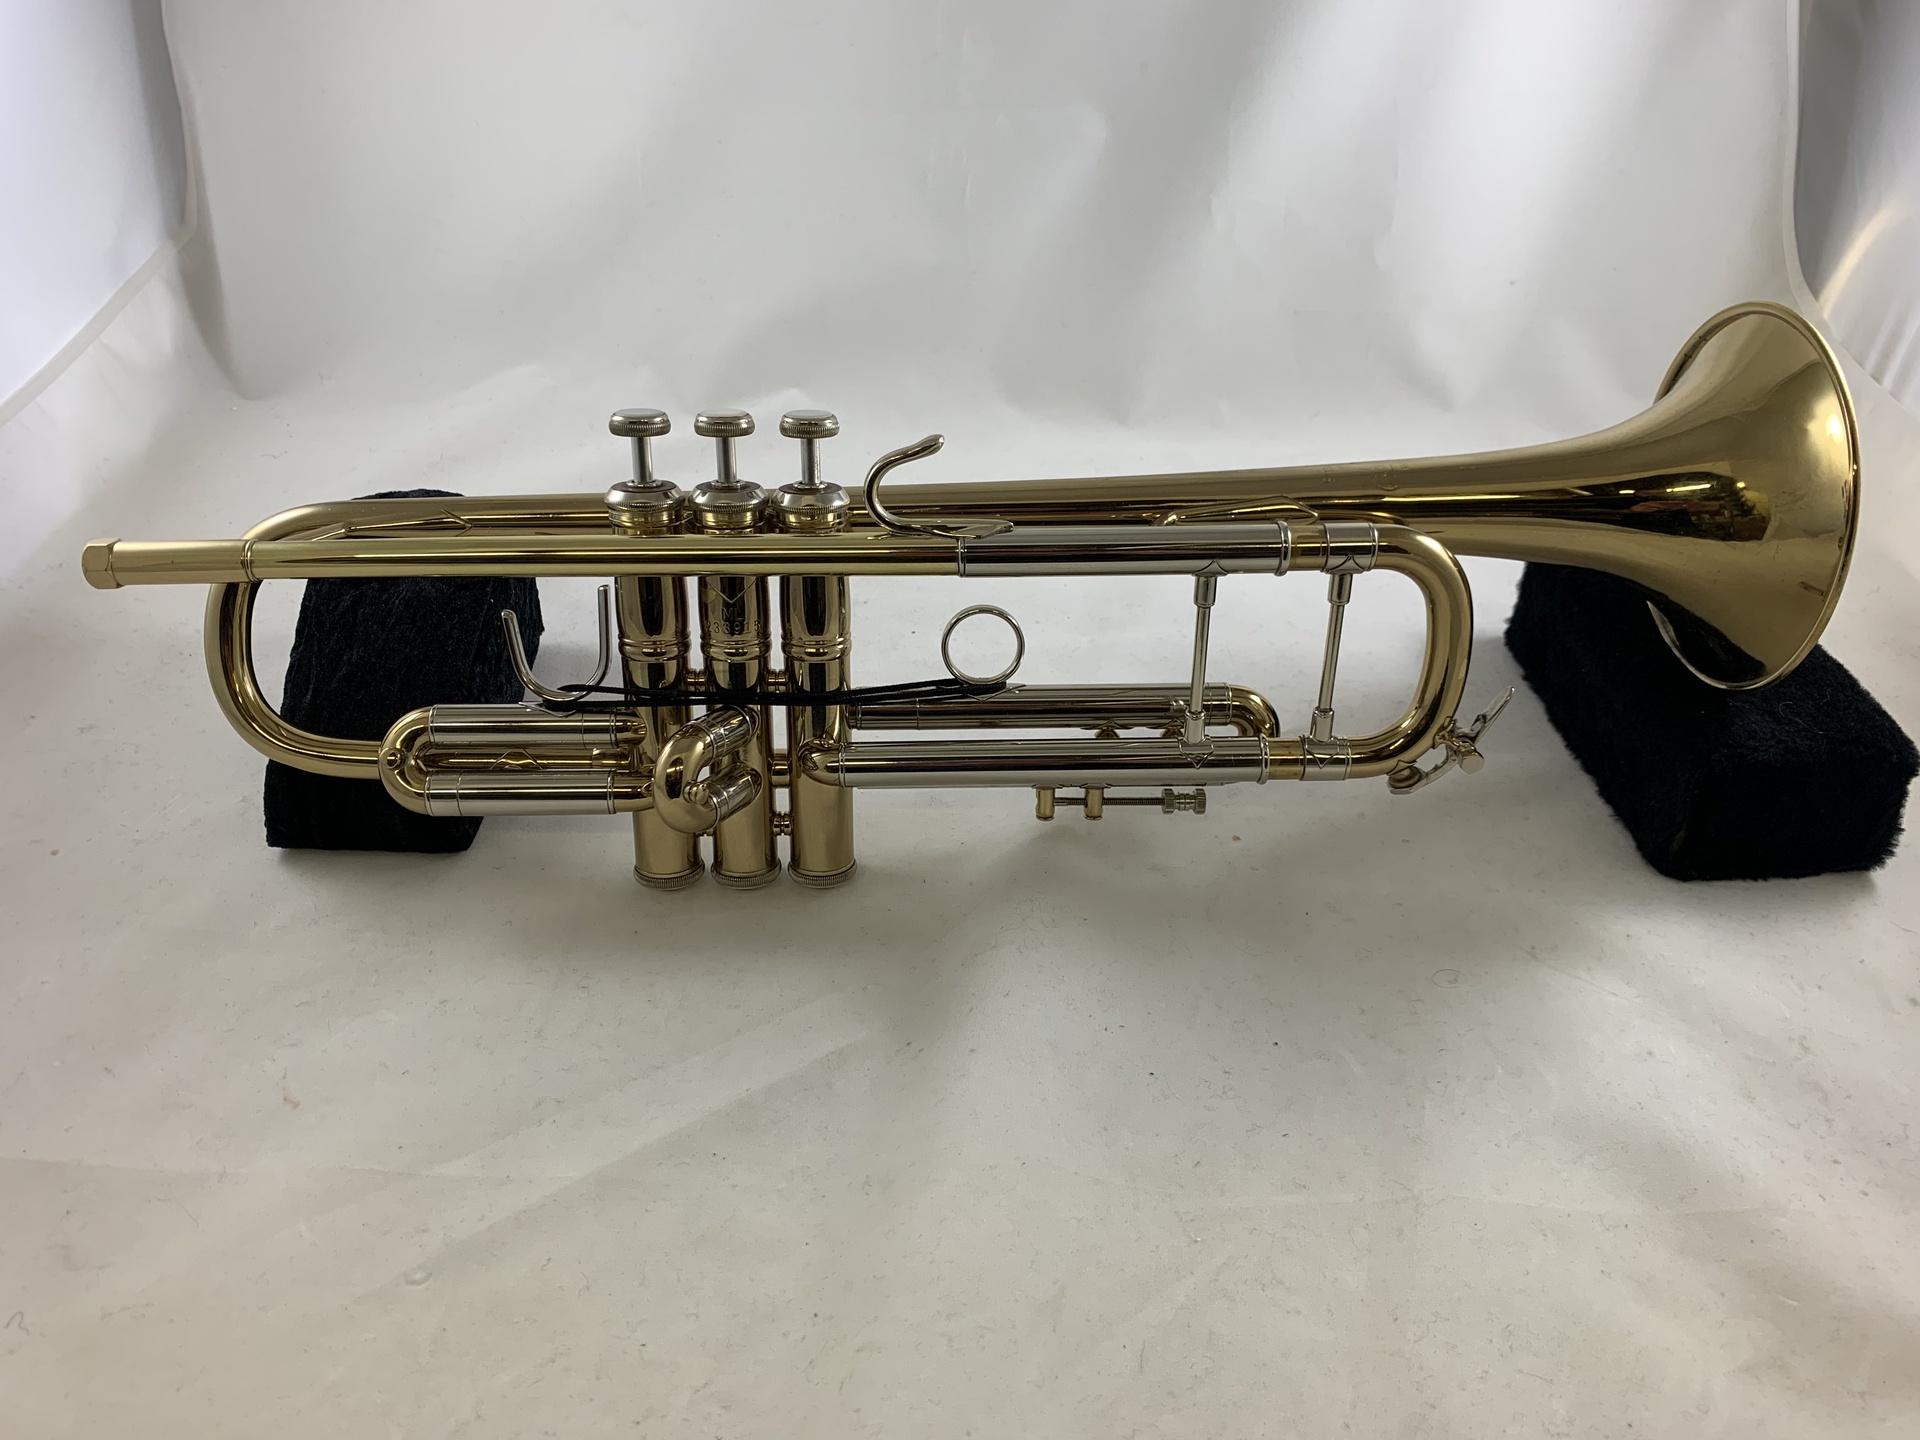 Bach Used LT180-37 Stradivarius Bb Trumpet SN 233915 - Thompson Music